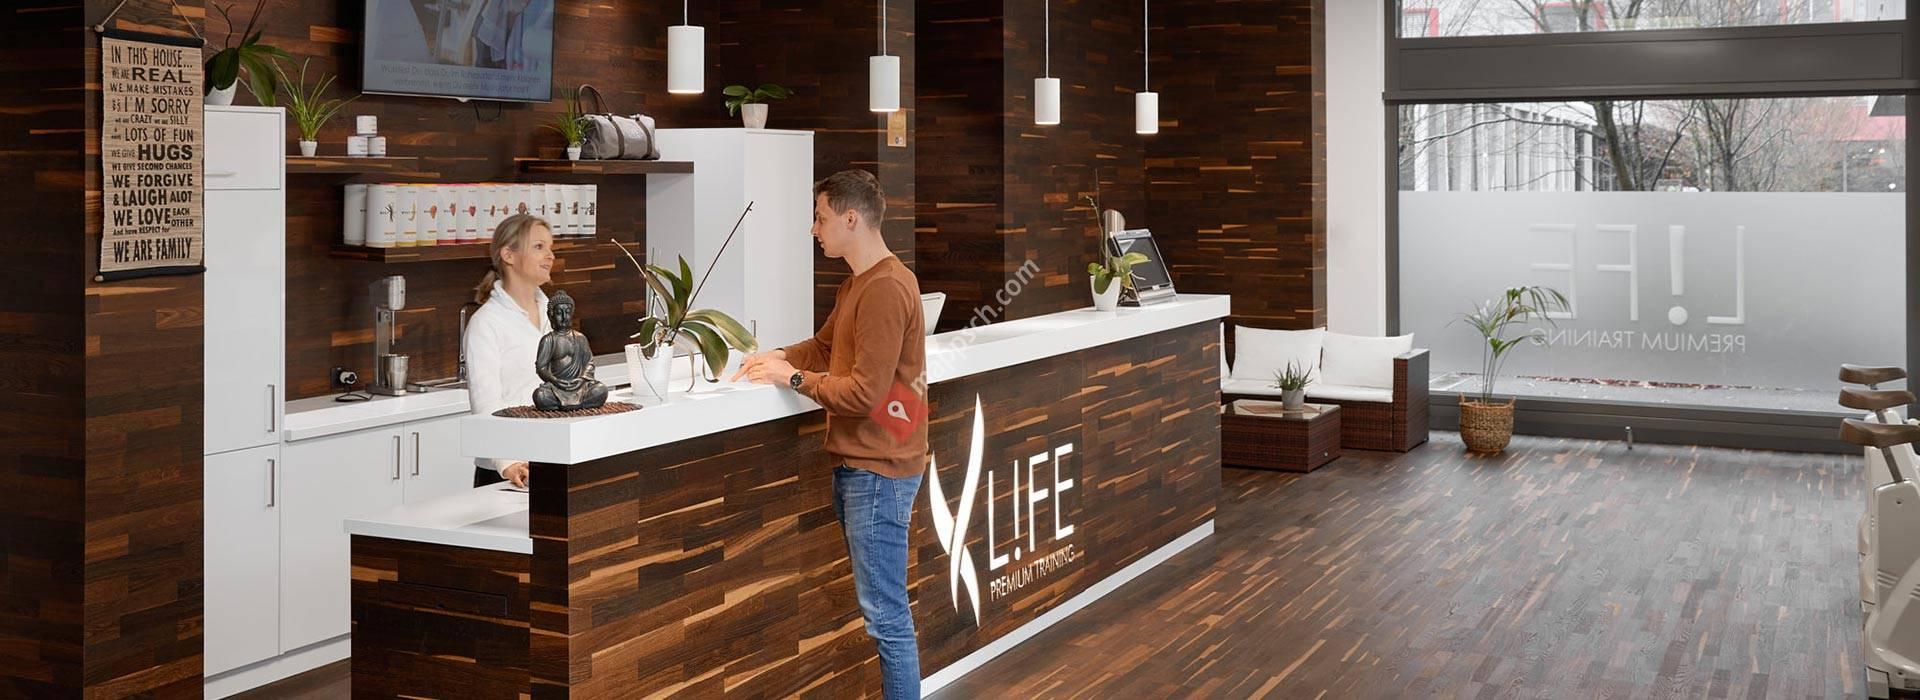 LIFE Swiss Health Club